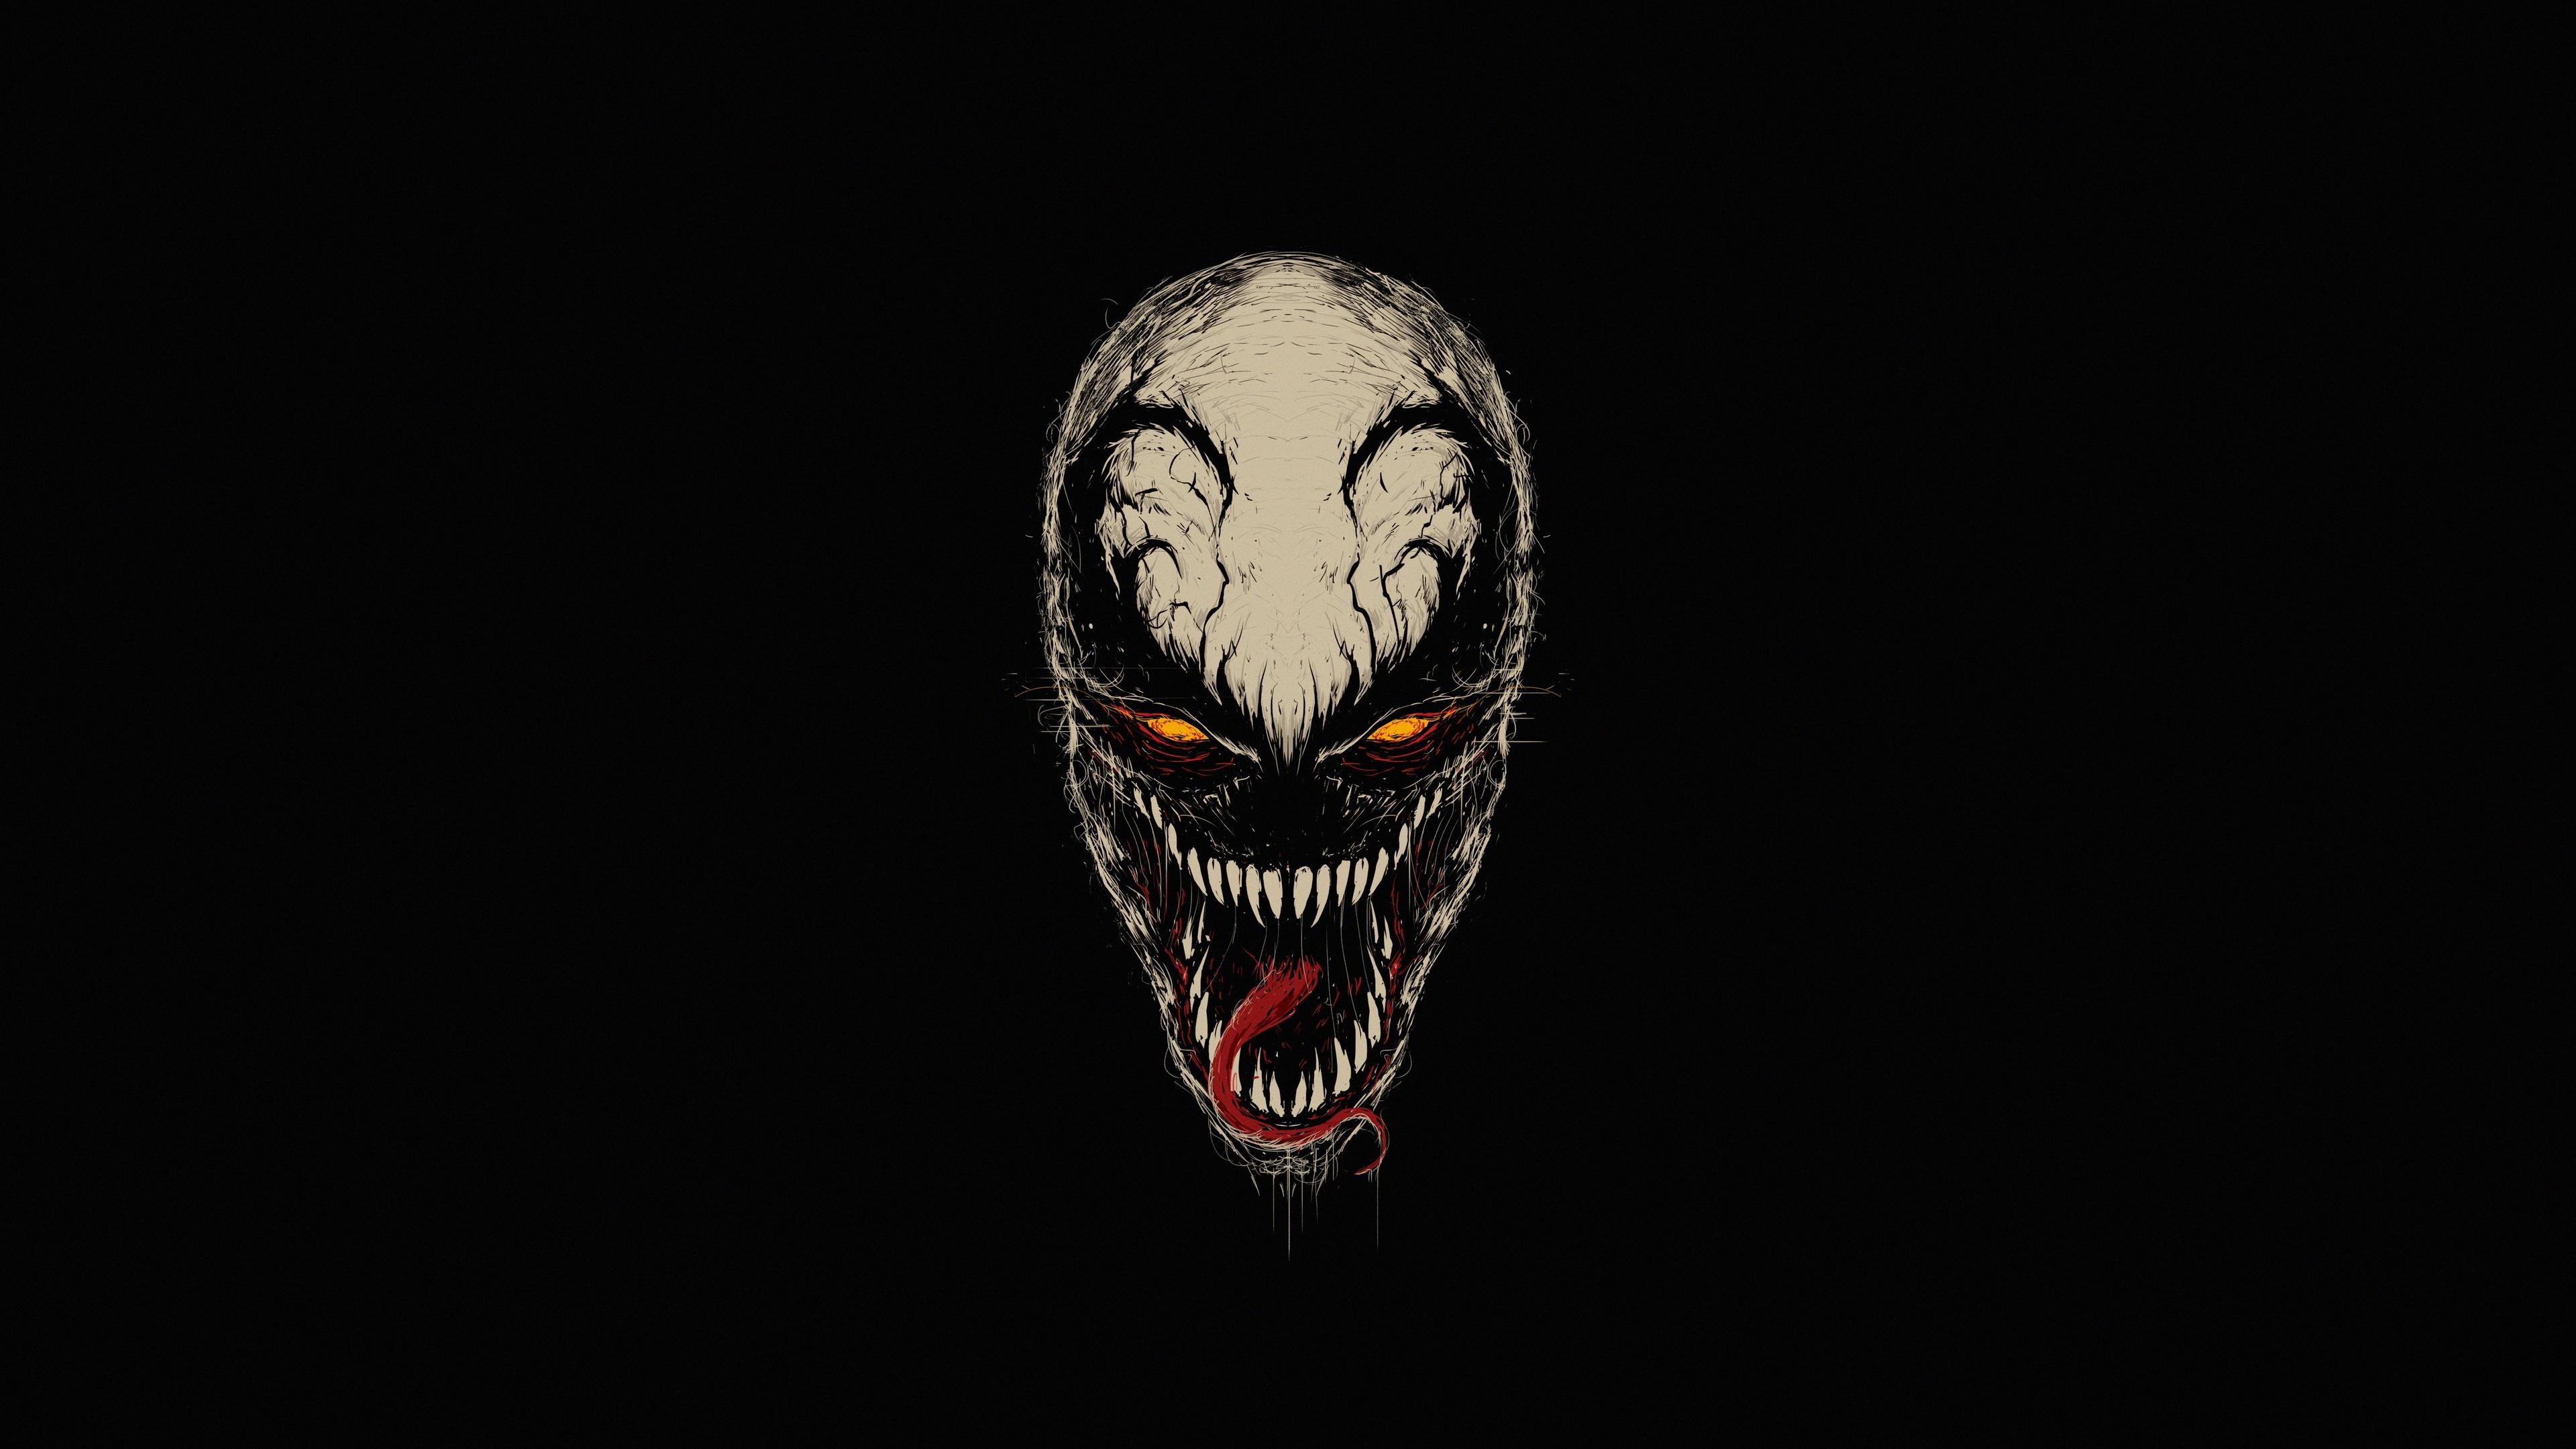 3840x2160 Anti Venom 4k Hd 4k Wallpapers Images